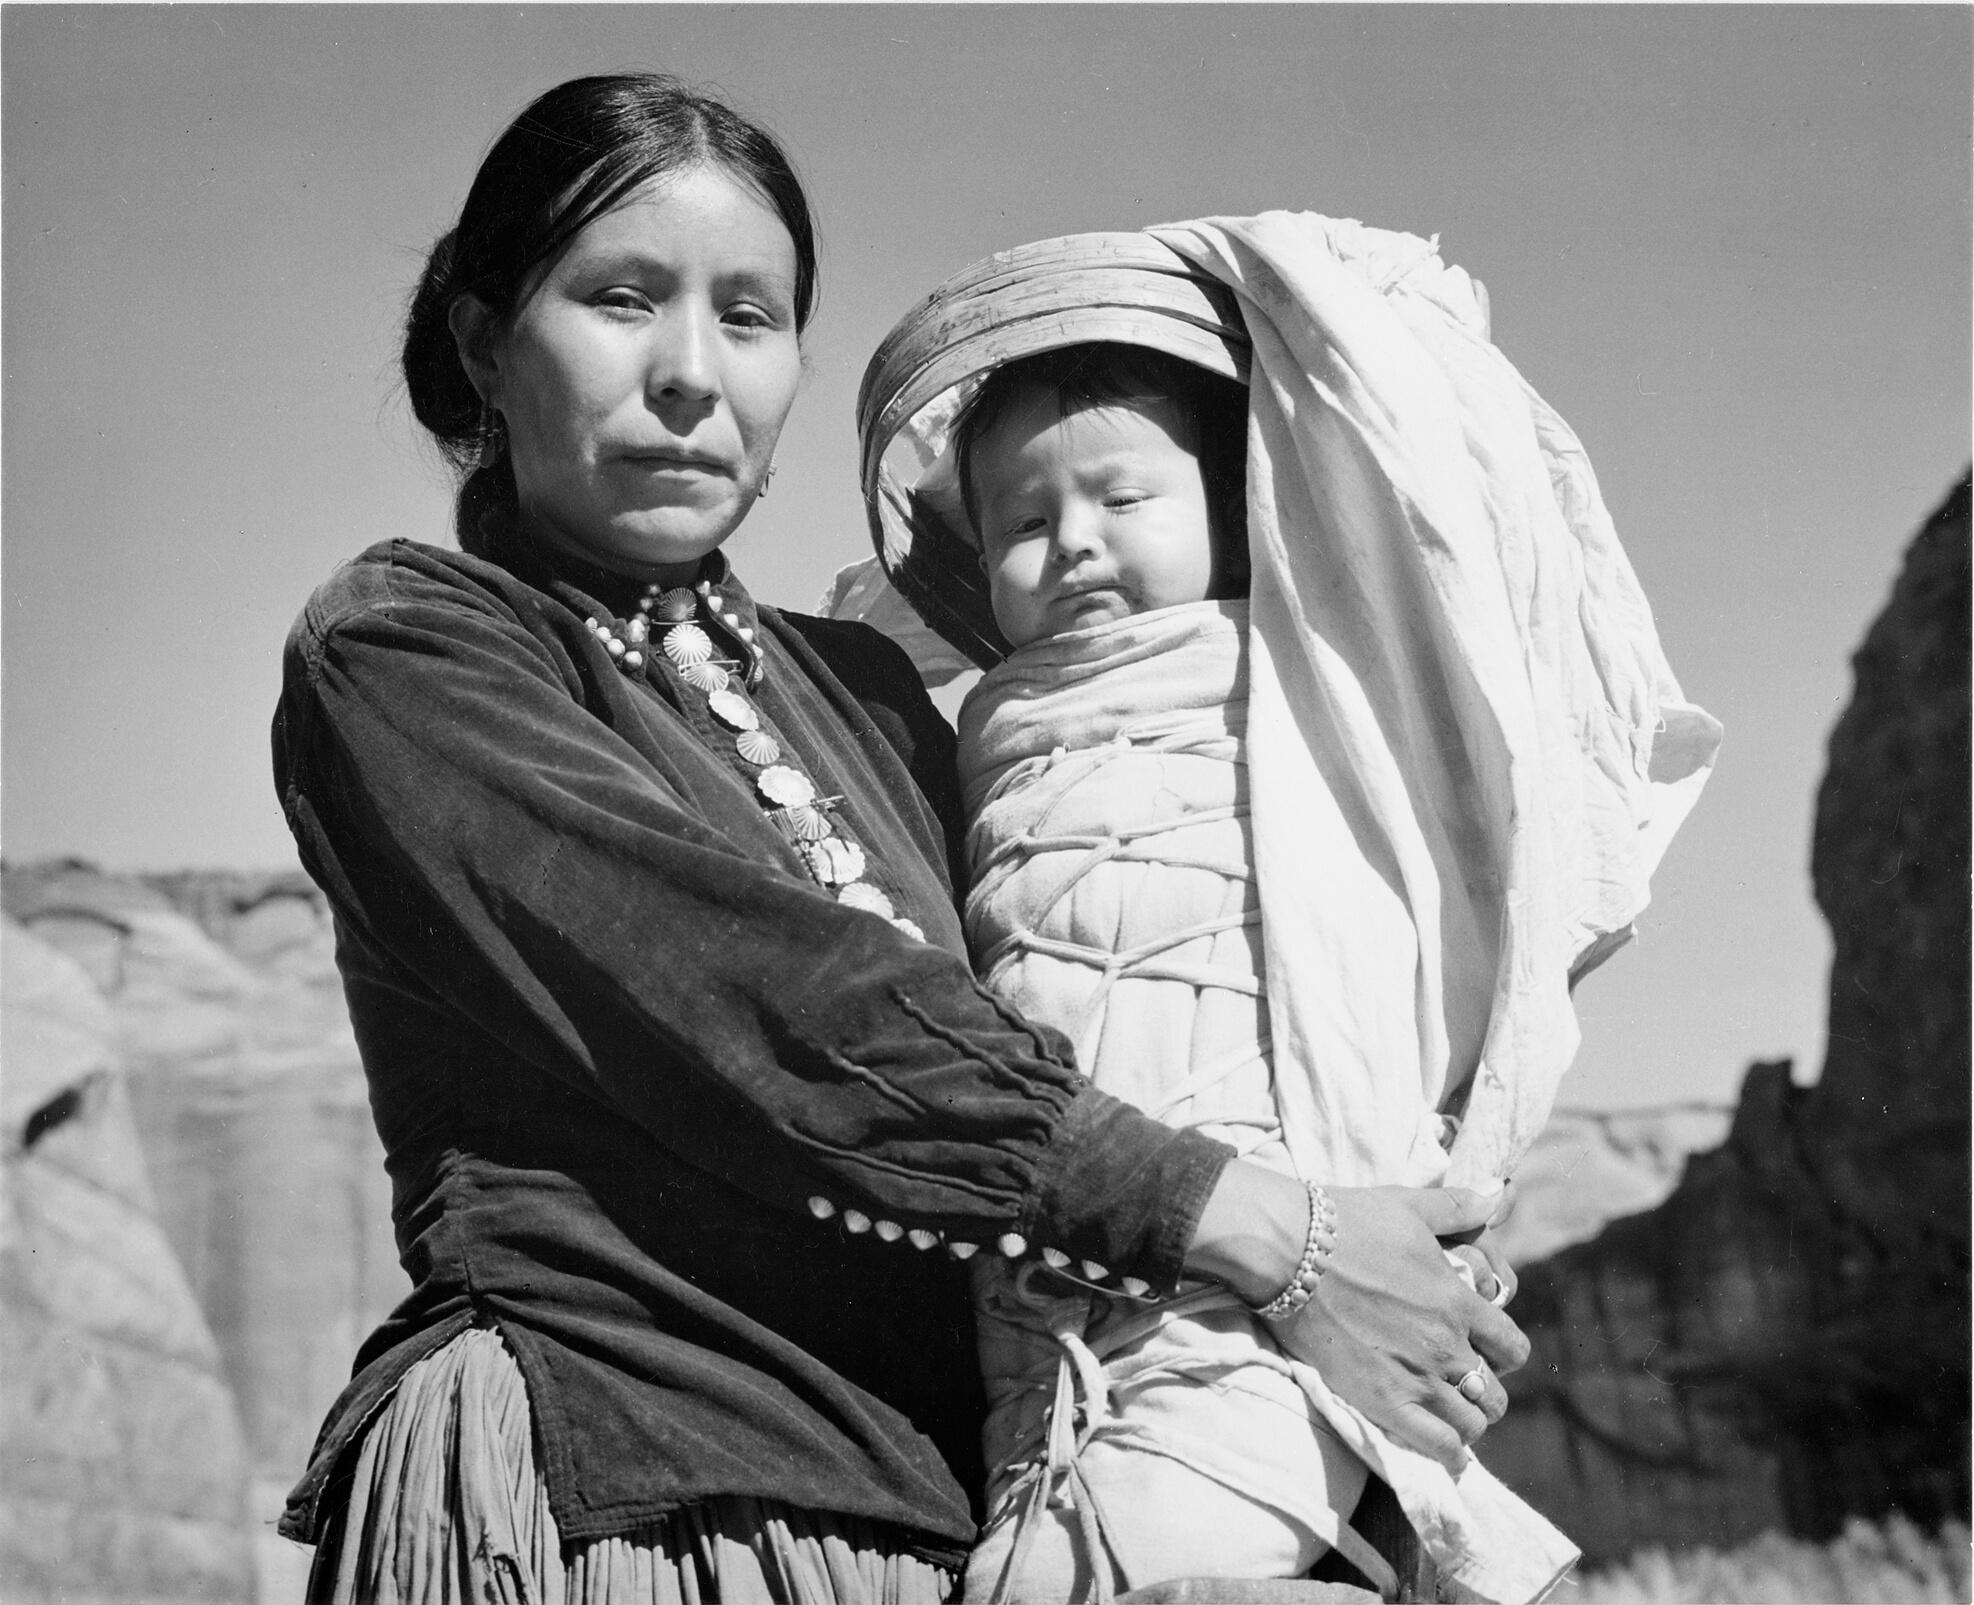 navajo_woman_and_infant_canyon_de_chelle_arizona-_canyon_de_chelly_national_monument_1933_-_1942_-_nara_-_519947